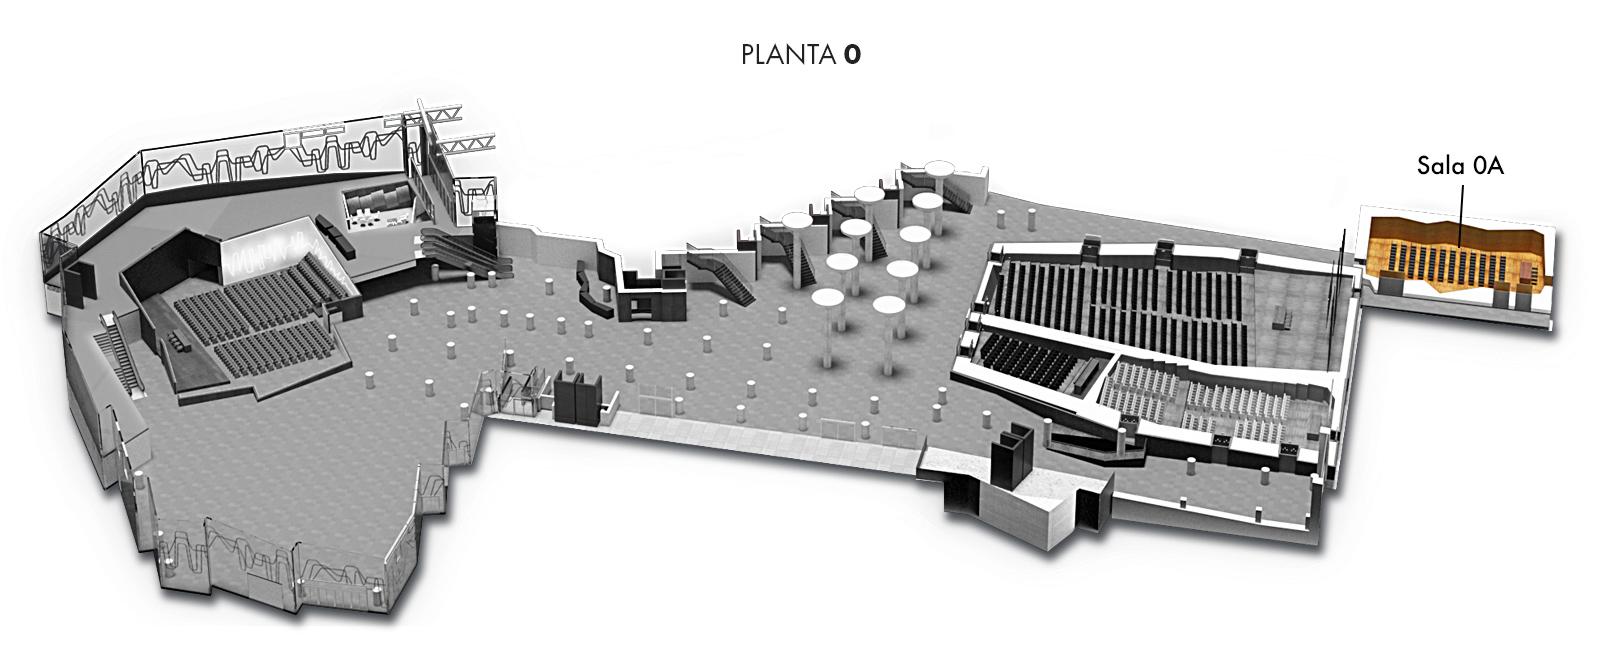 Sala 0A, Planta 0 | Palacio Euskalduna Jauregia